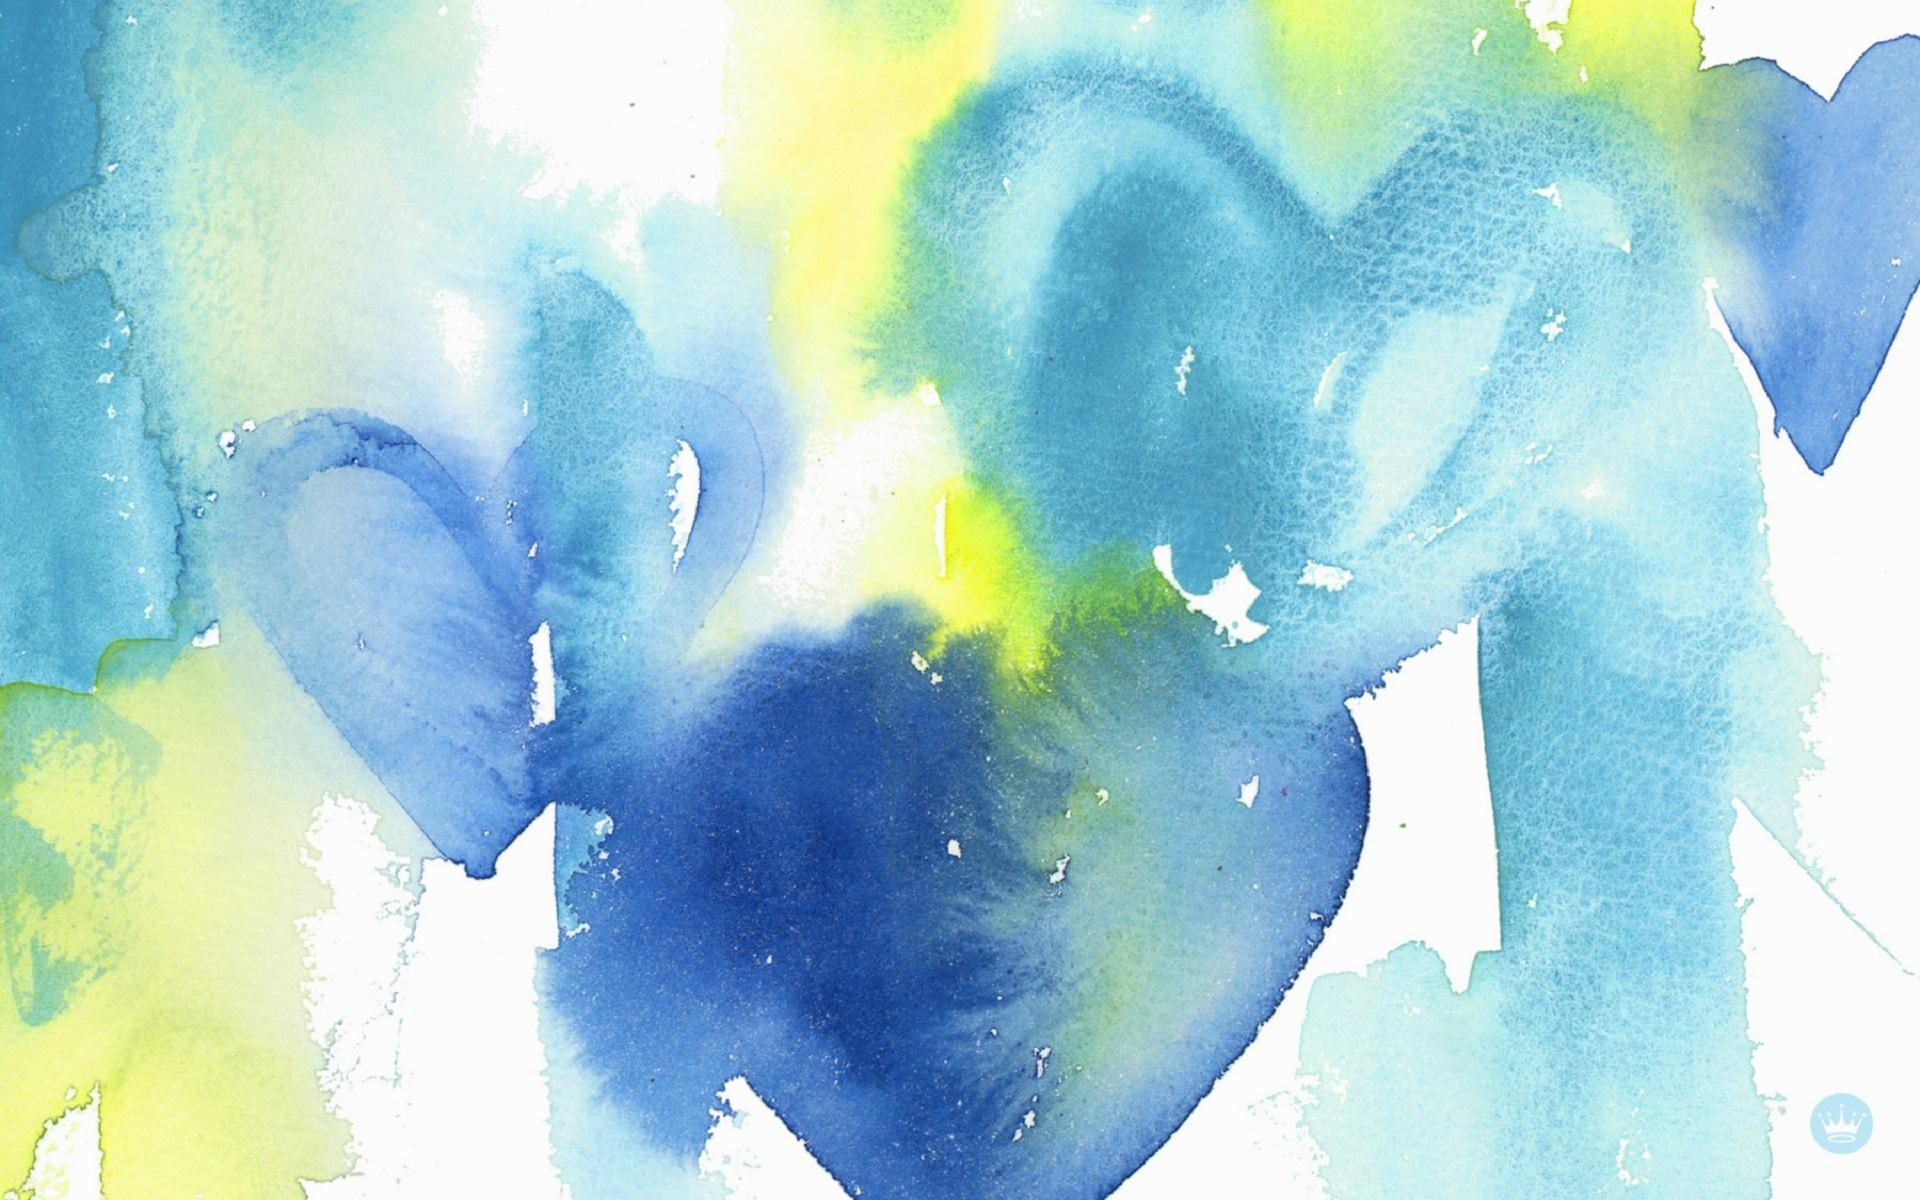 Watercolor-Love-June-desktop-wallpapers